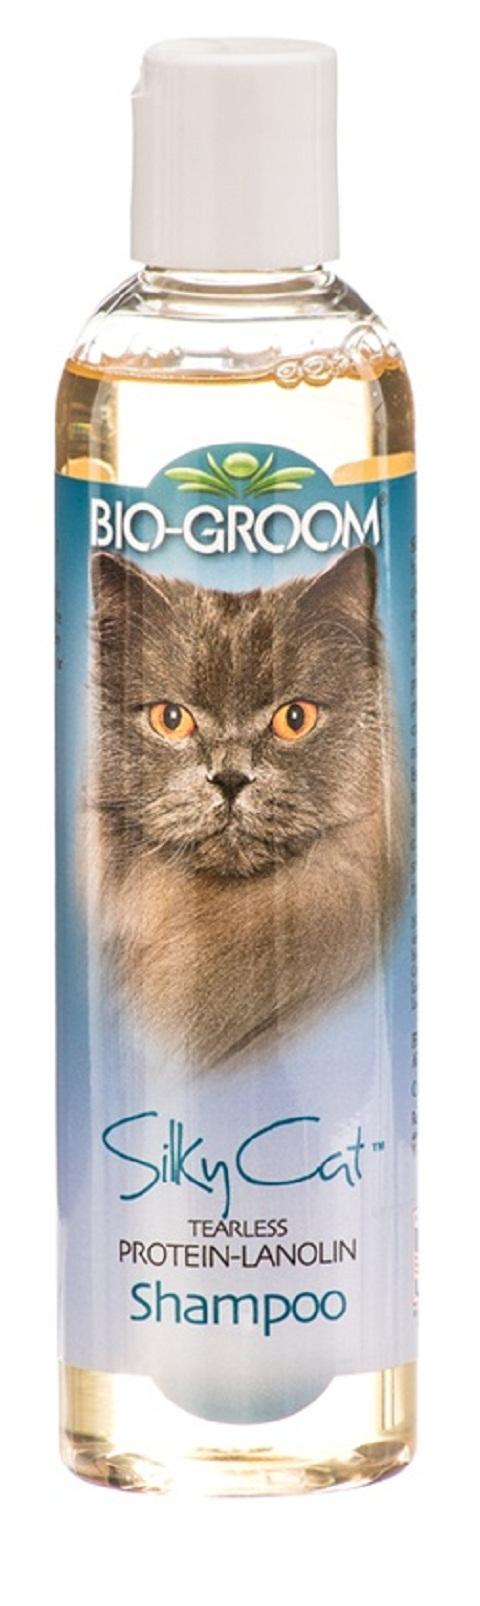 Bio groom Silky Cat Shampoo –